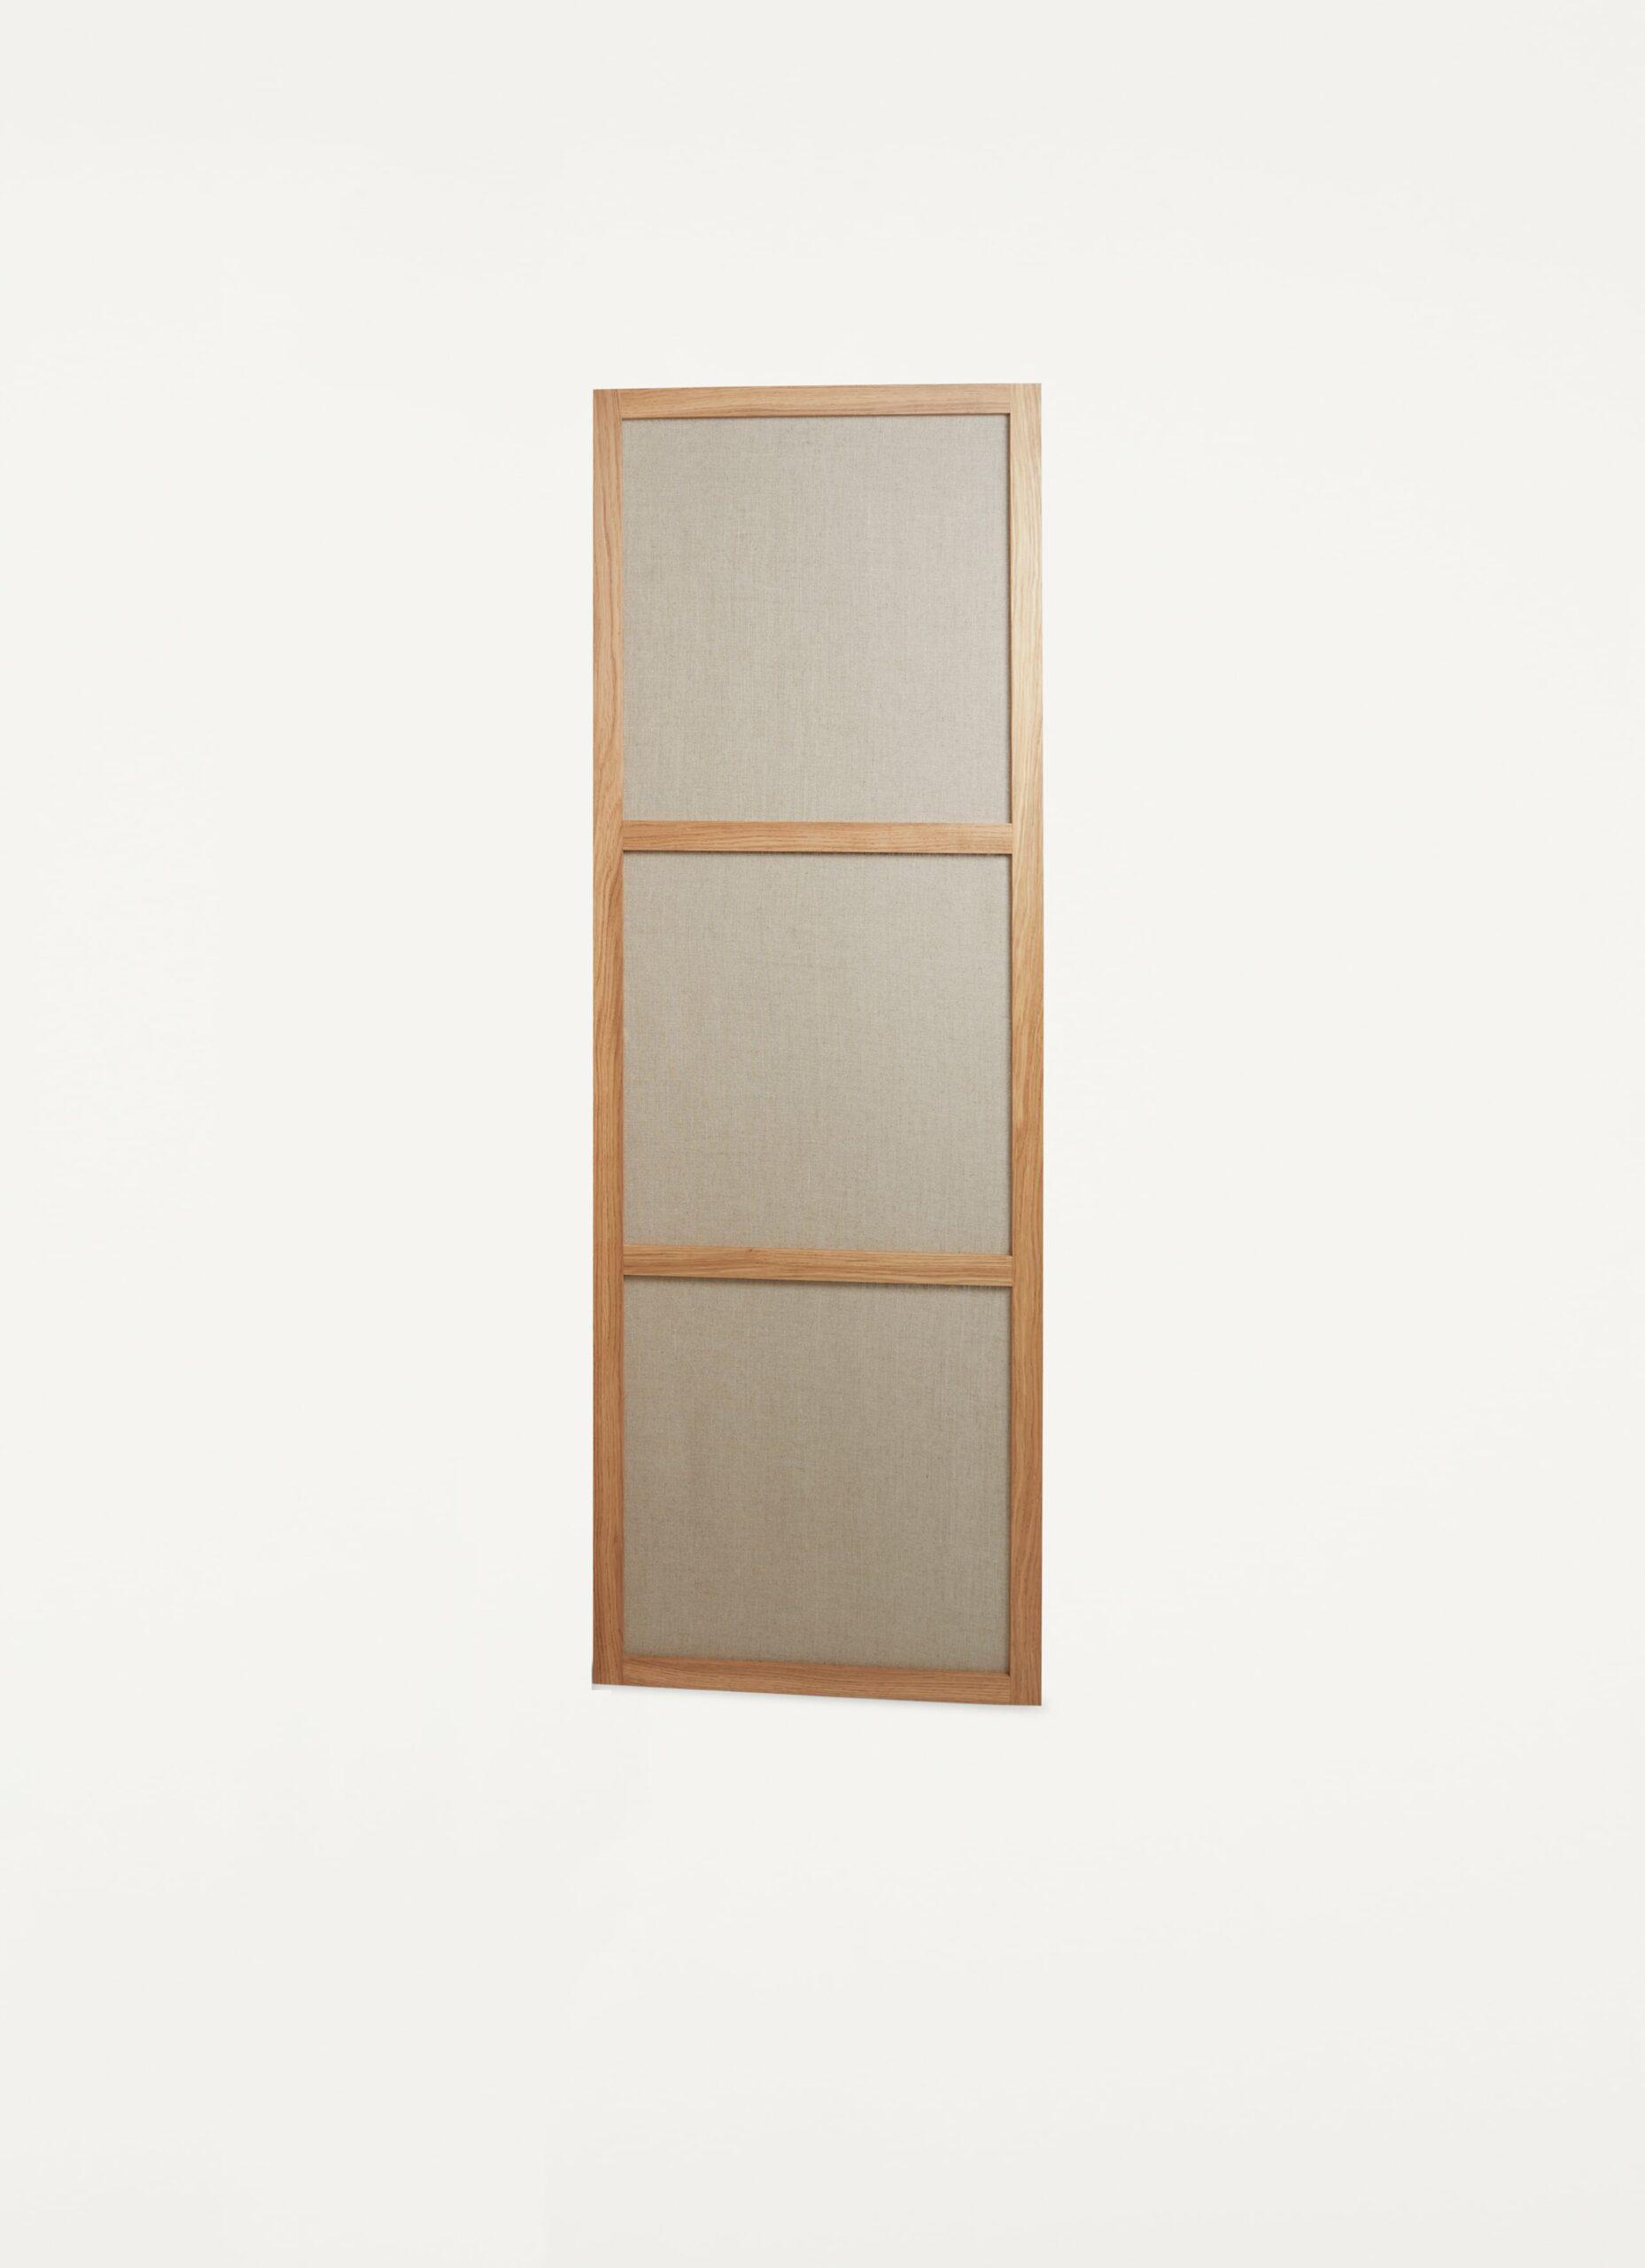 Frama - Room Divider - One Panel